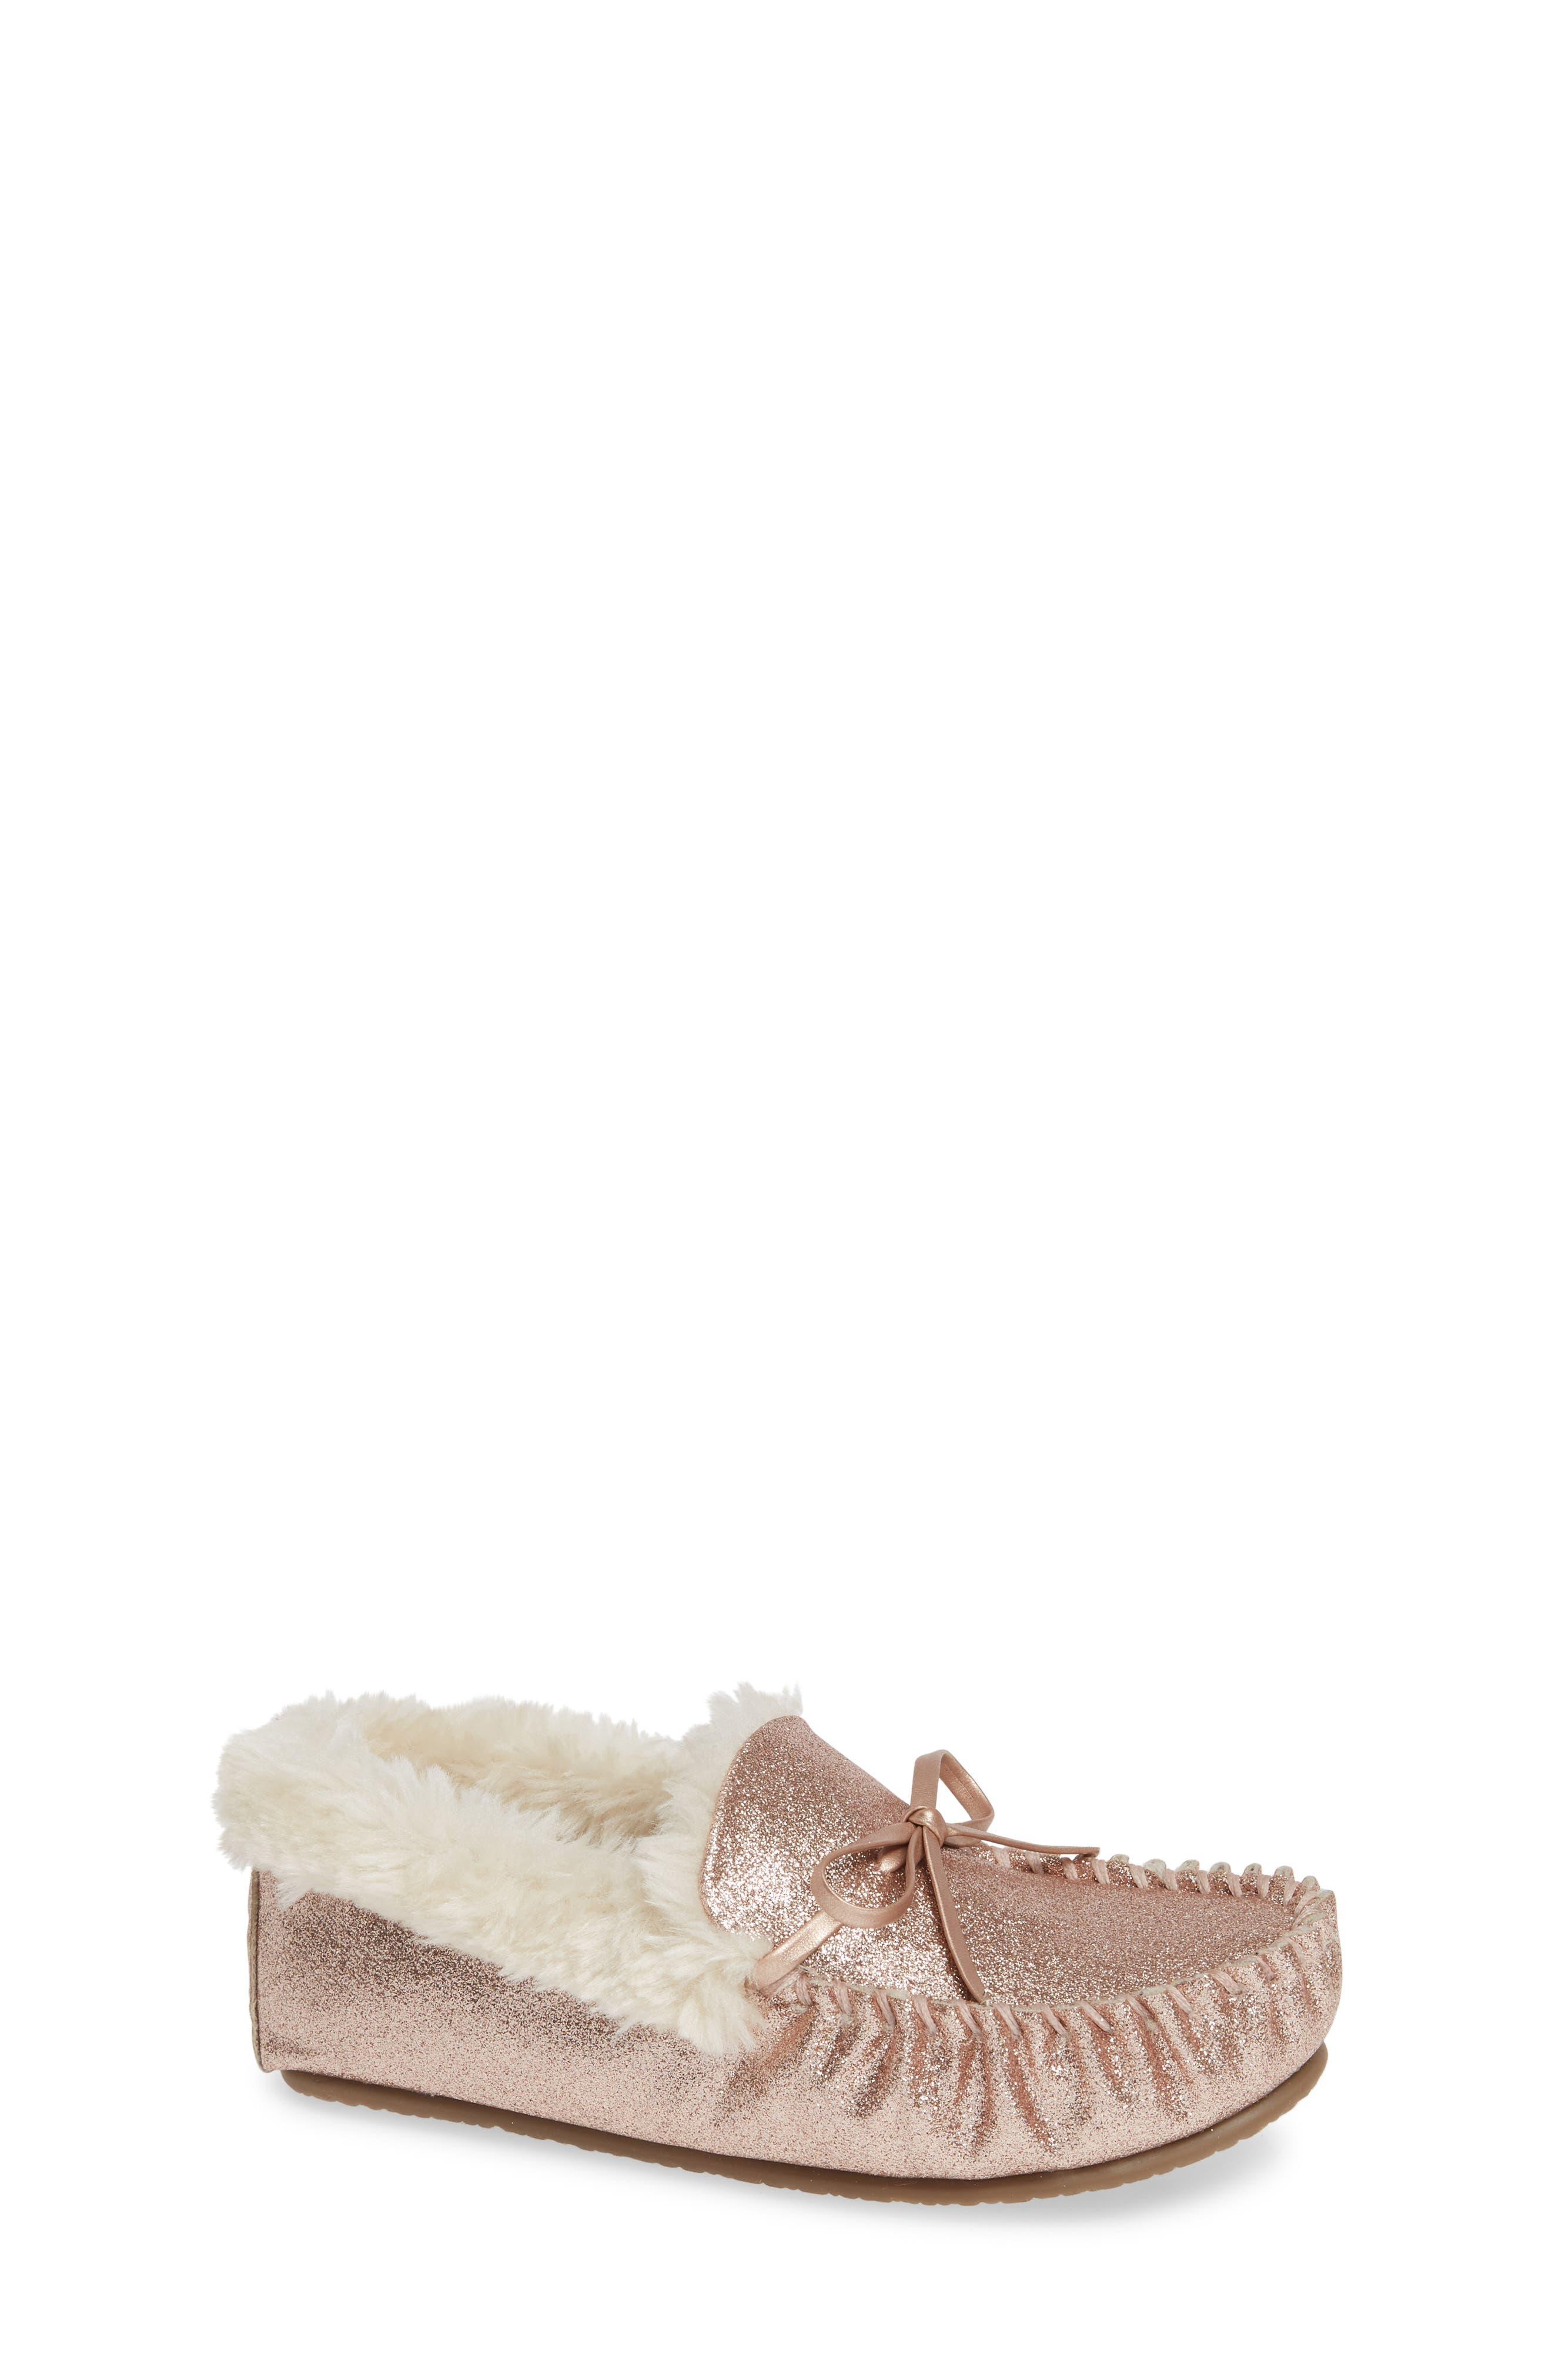 Mila Faux Fur Moccasin Slipper, Main, color, 710